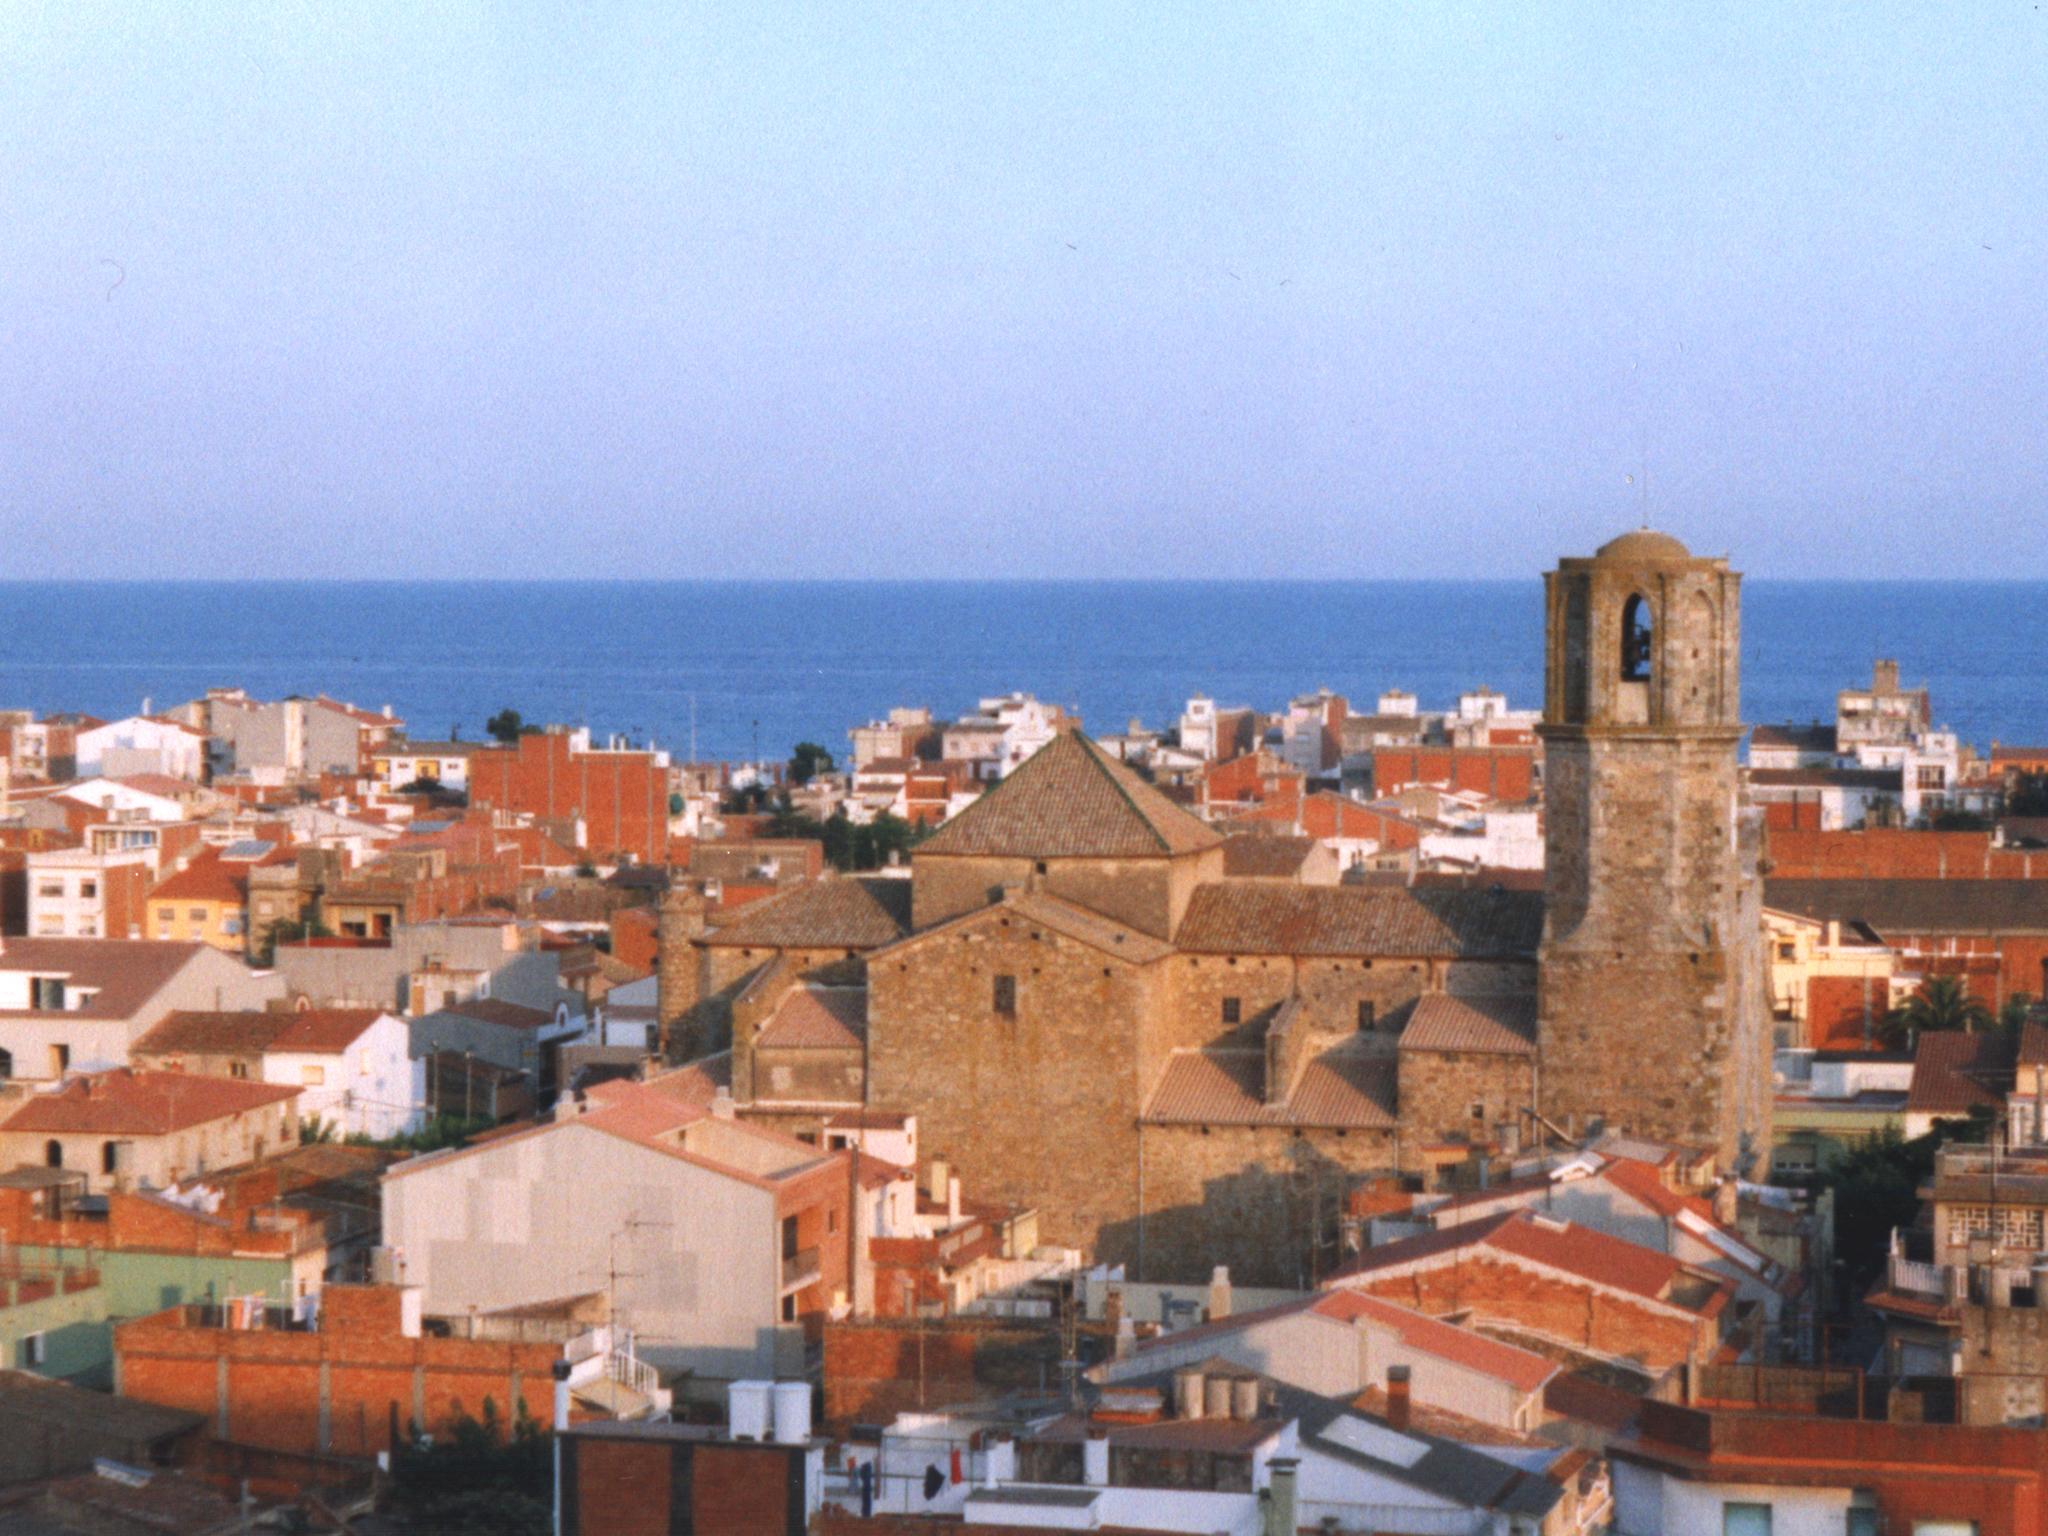 http://upload.wikimedia.org/wikipedia/commons/9/9f/Malgrat_de_Mar_03.JPG